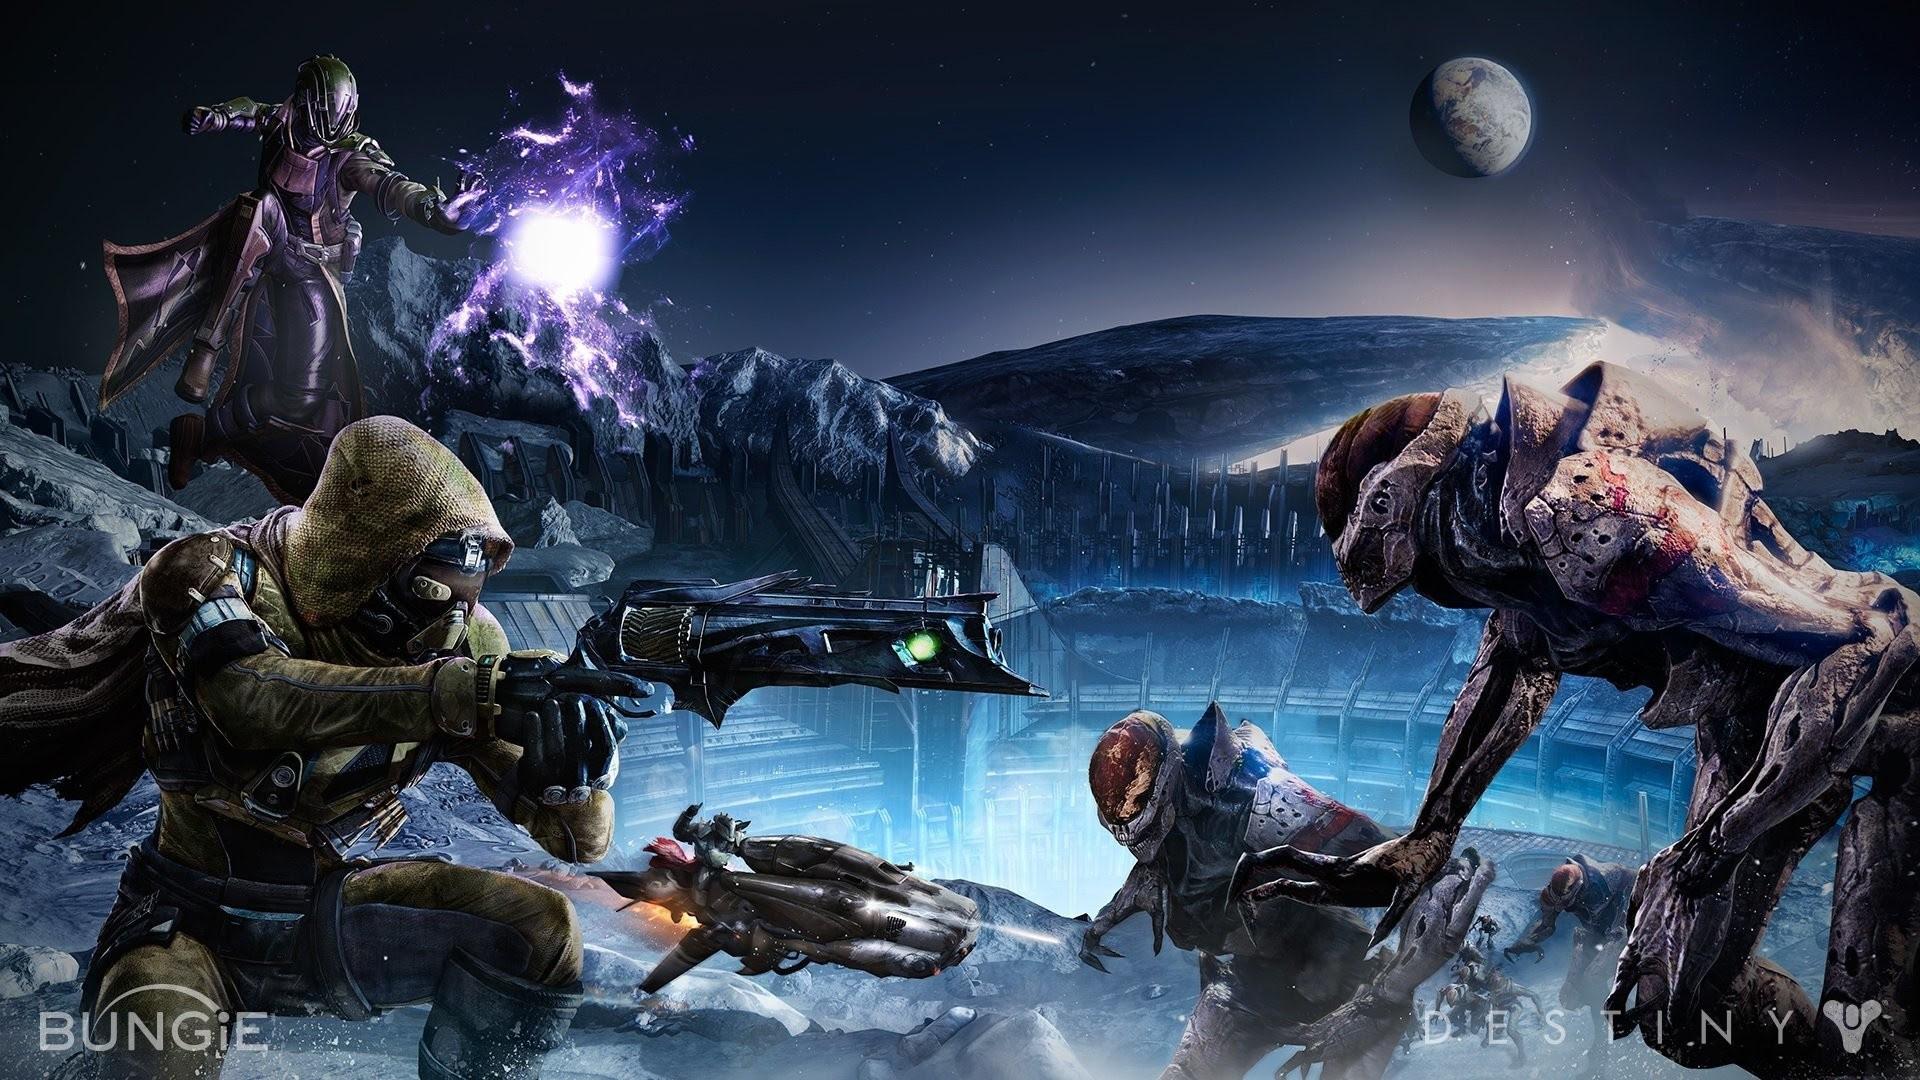 Destiny 1080p Wallpaper 79 Images